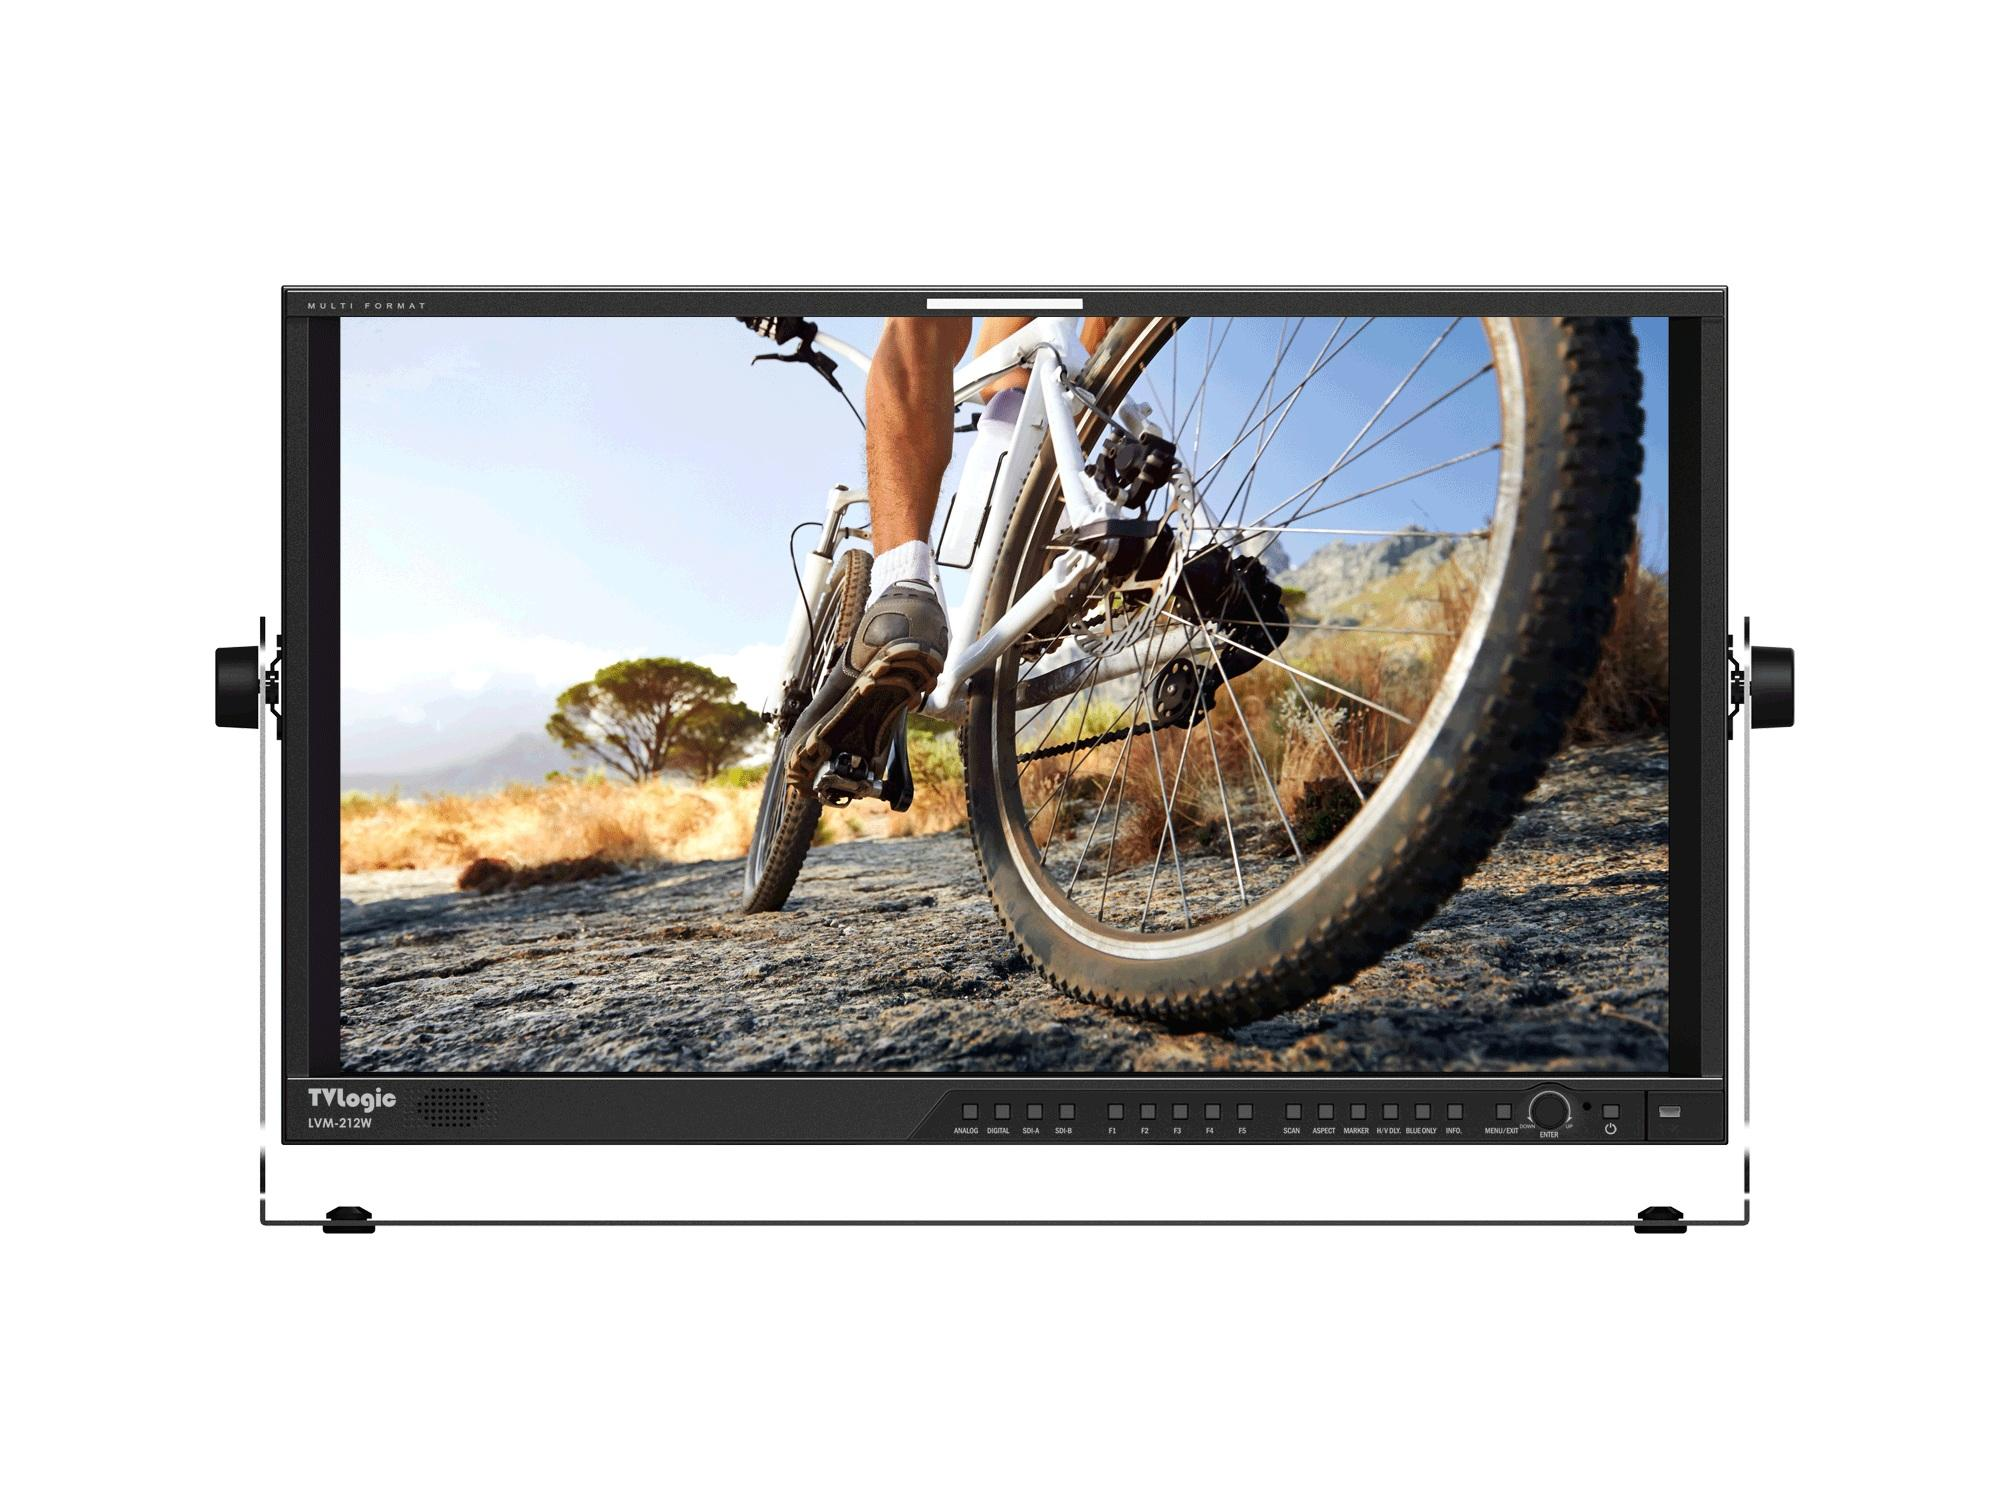 TVlogic LVM-212W(3G) 21.5 inch Composite/Component/3G-SDI/DVI/HDMI 1920x1080 19 inch Rack-size LCD Monitor